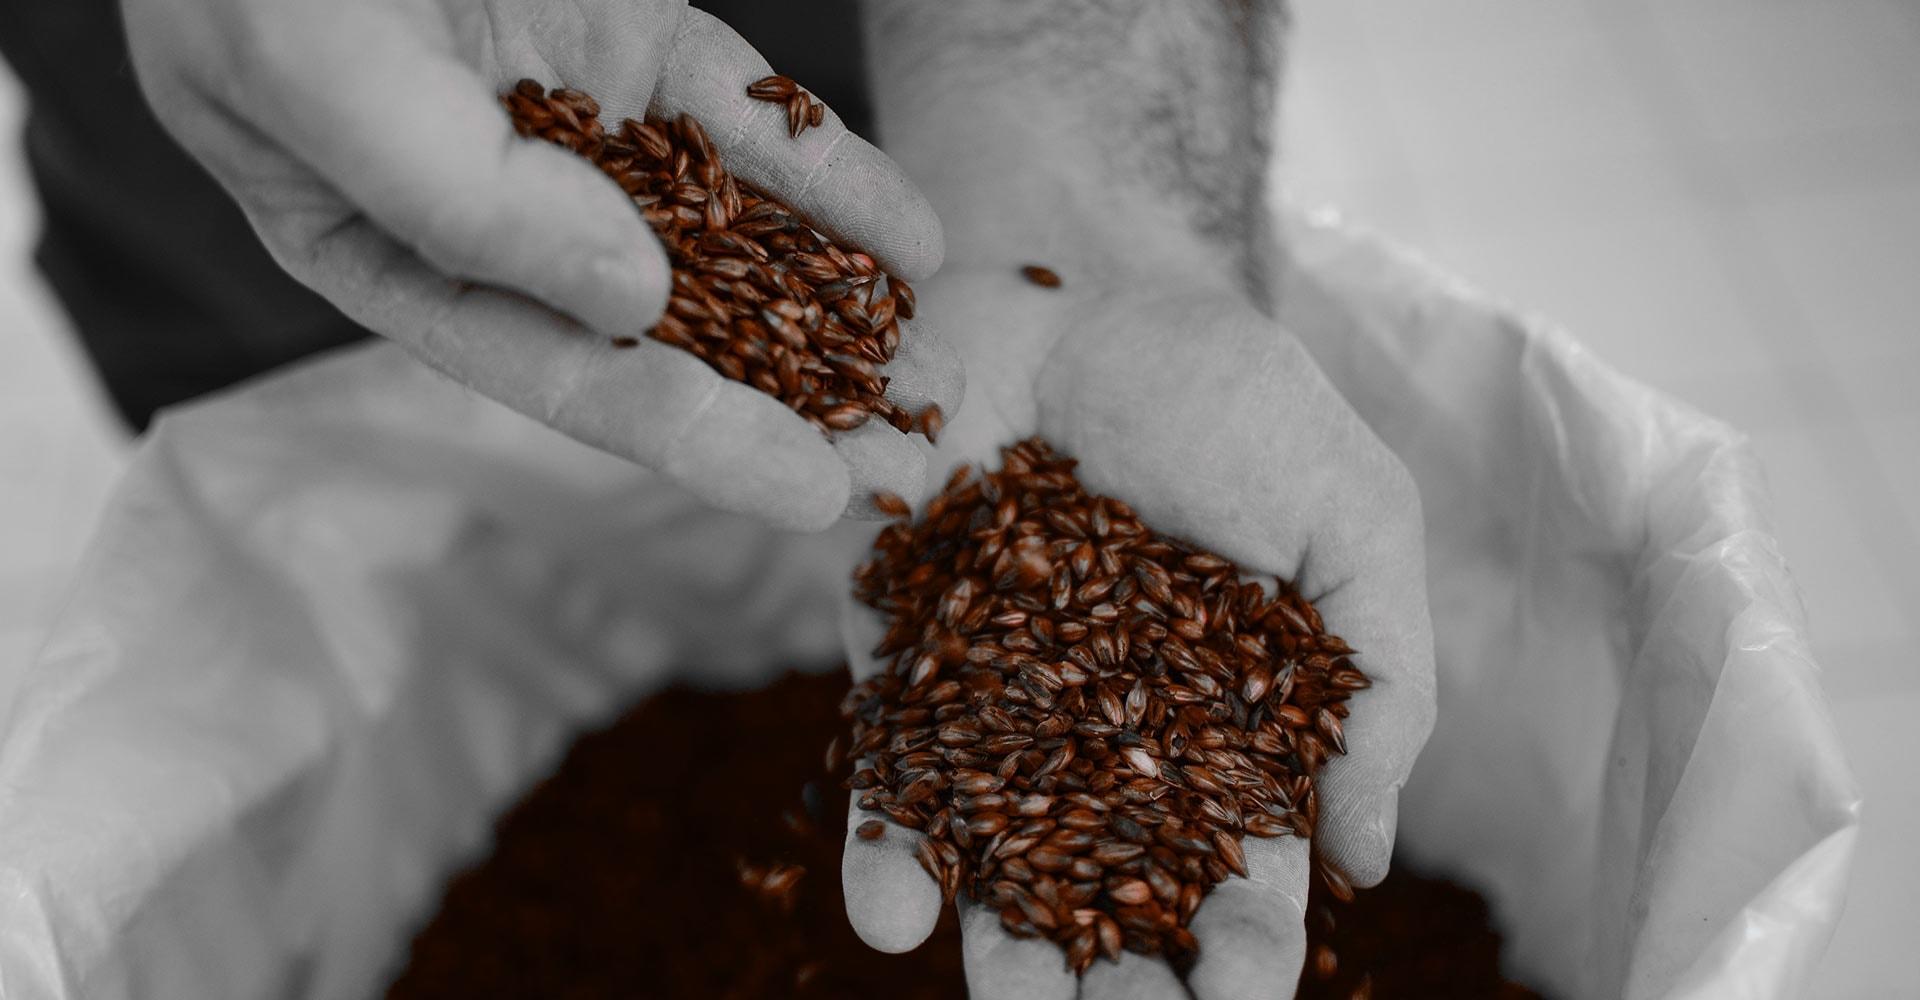 https://www.birrificiomarduk.com/wp-content/uploads/2020/06/01-marduk-brewery-agricoltura-filiera-materie-prime-birrificio-birre-1.jpg